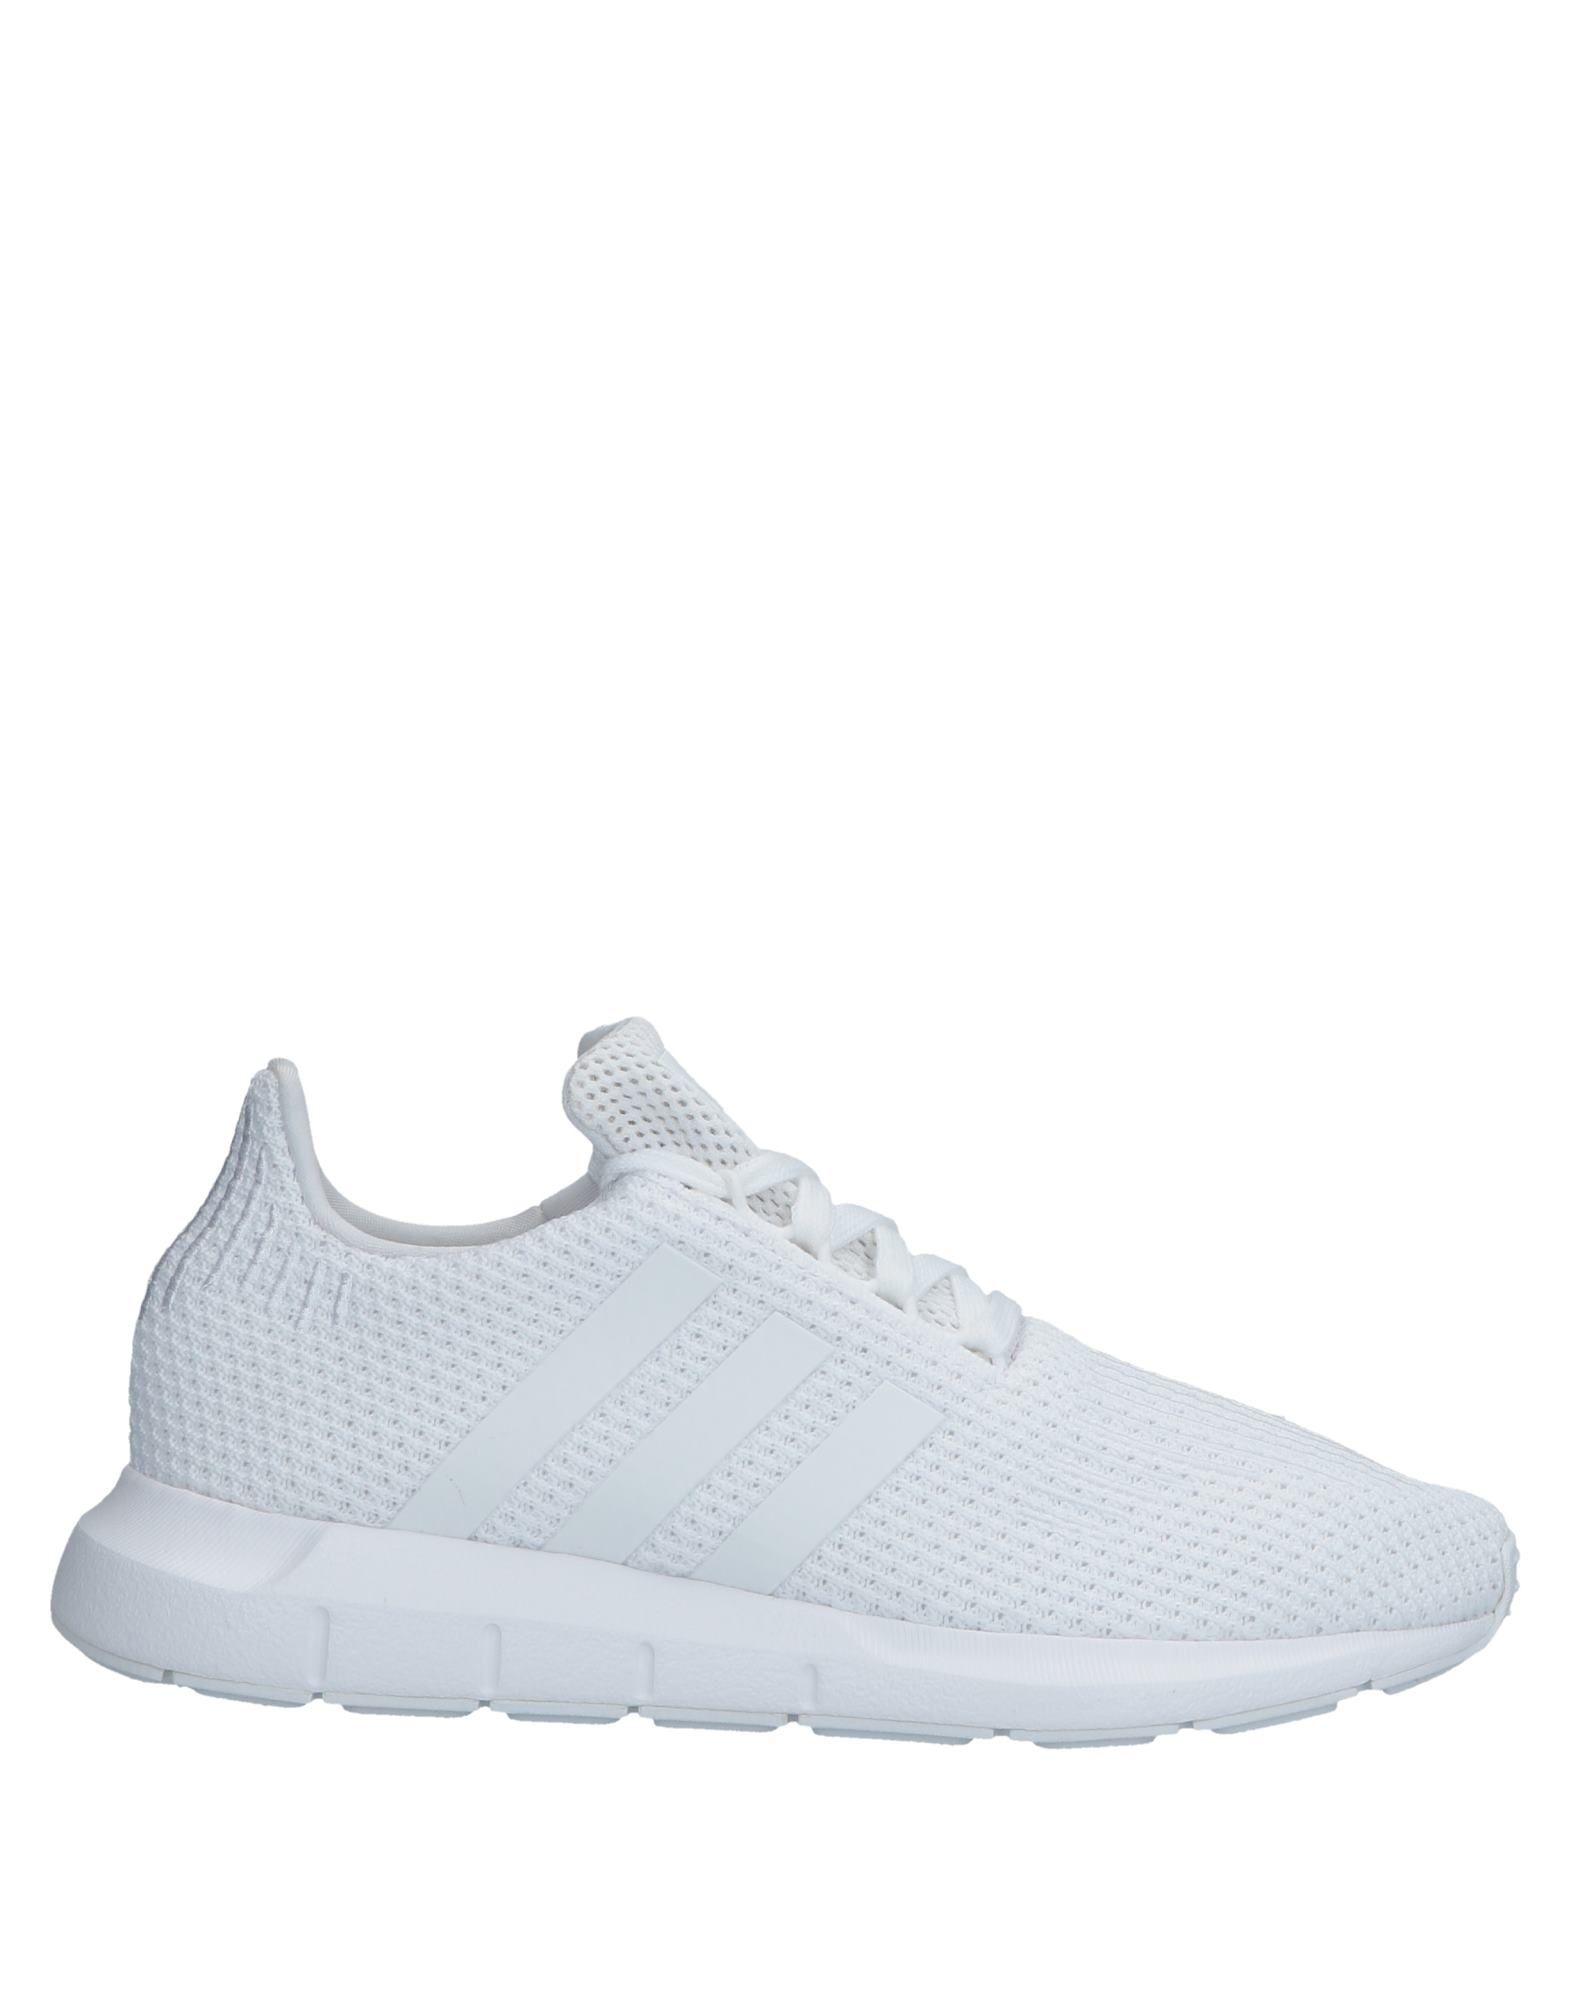 Adidas Originals Sneakers - Women Adidas Originals Sneakers online on 11561774RR  United Kingdom - 11561774RR on 51760b